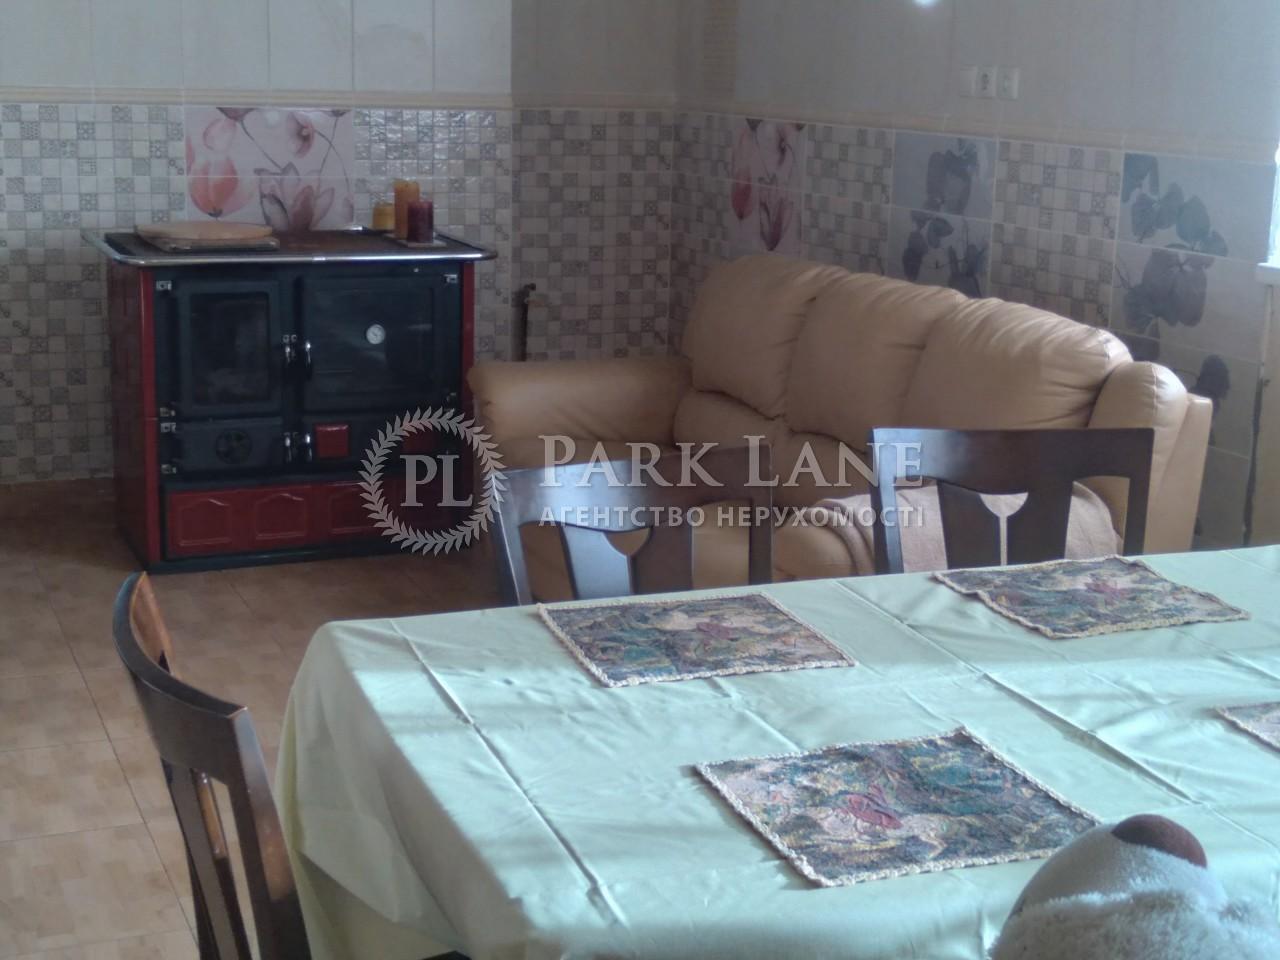 Дом R-38860, Пушкинская, Буча (город) - Фото 5